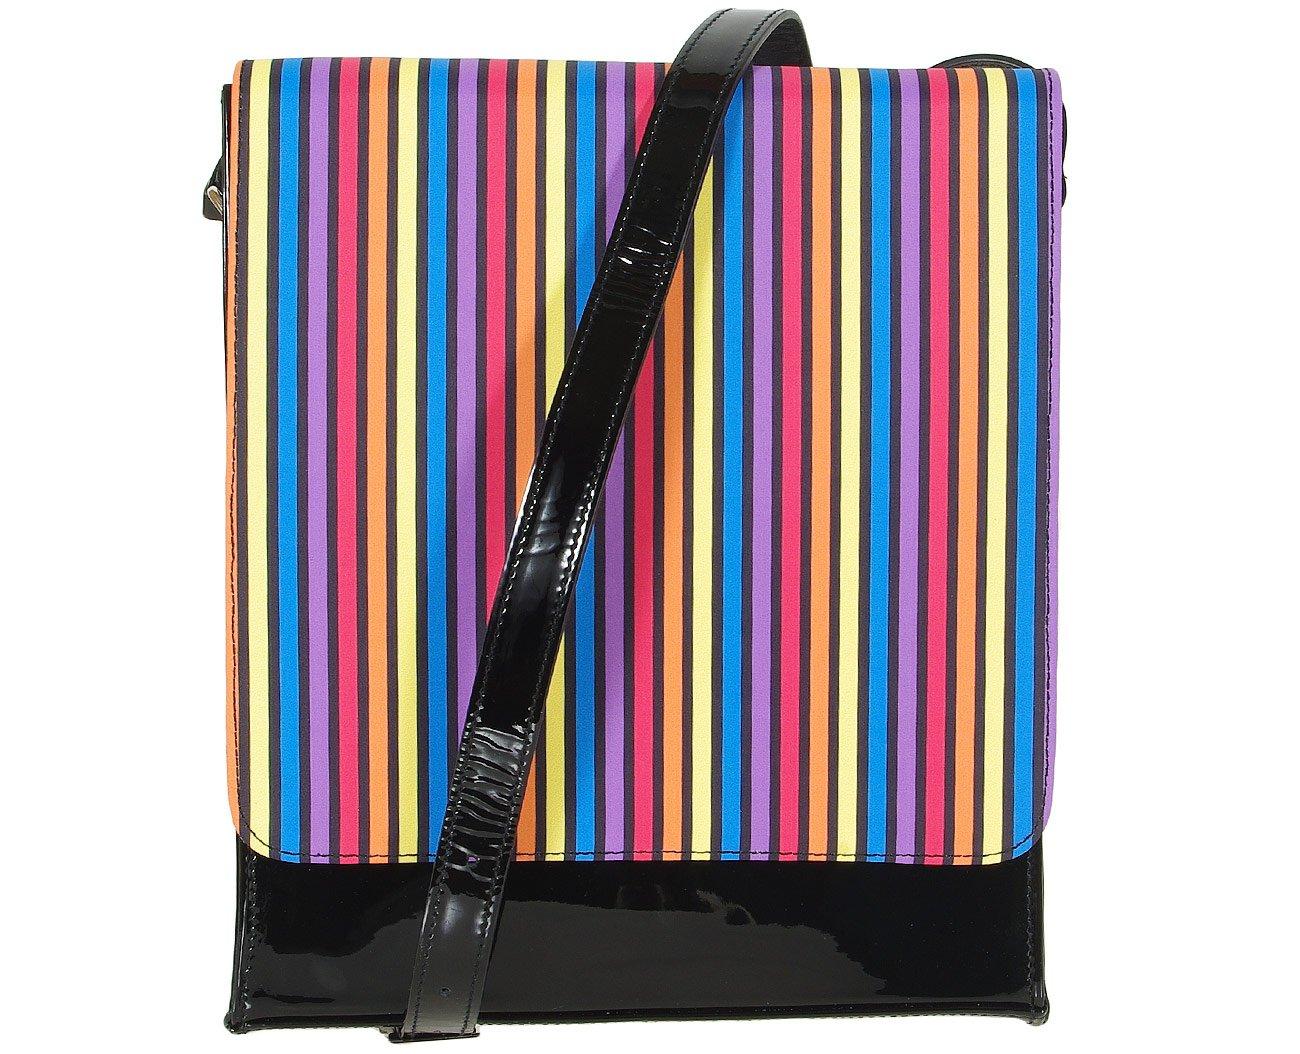 Azuree Cannes S319 torebka na ramię vernis noir tissu rayo